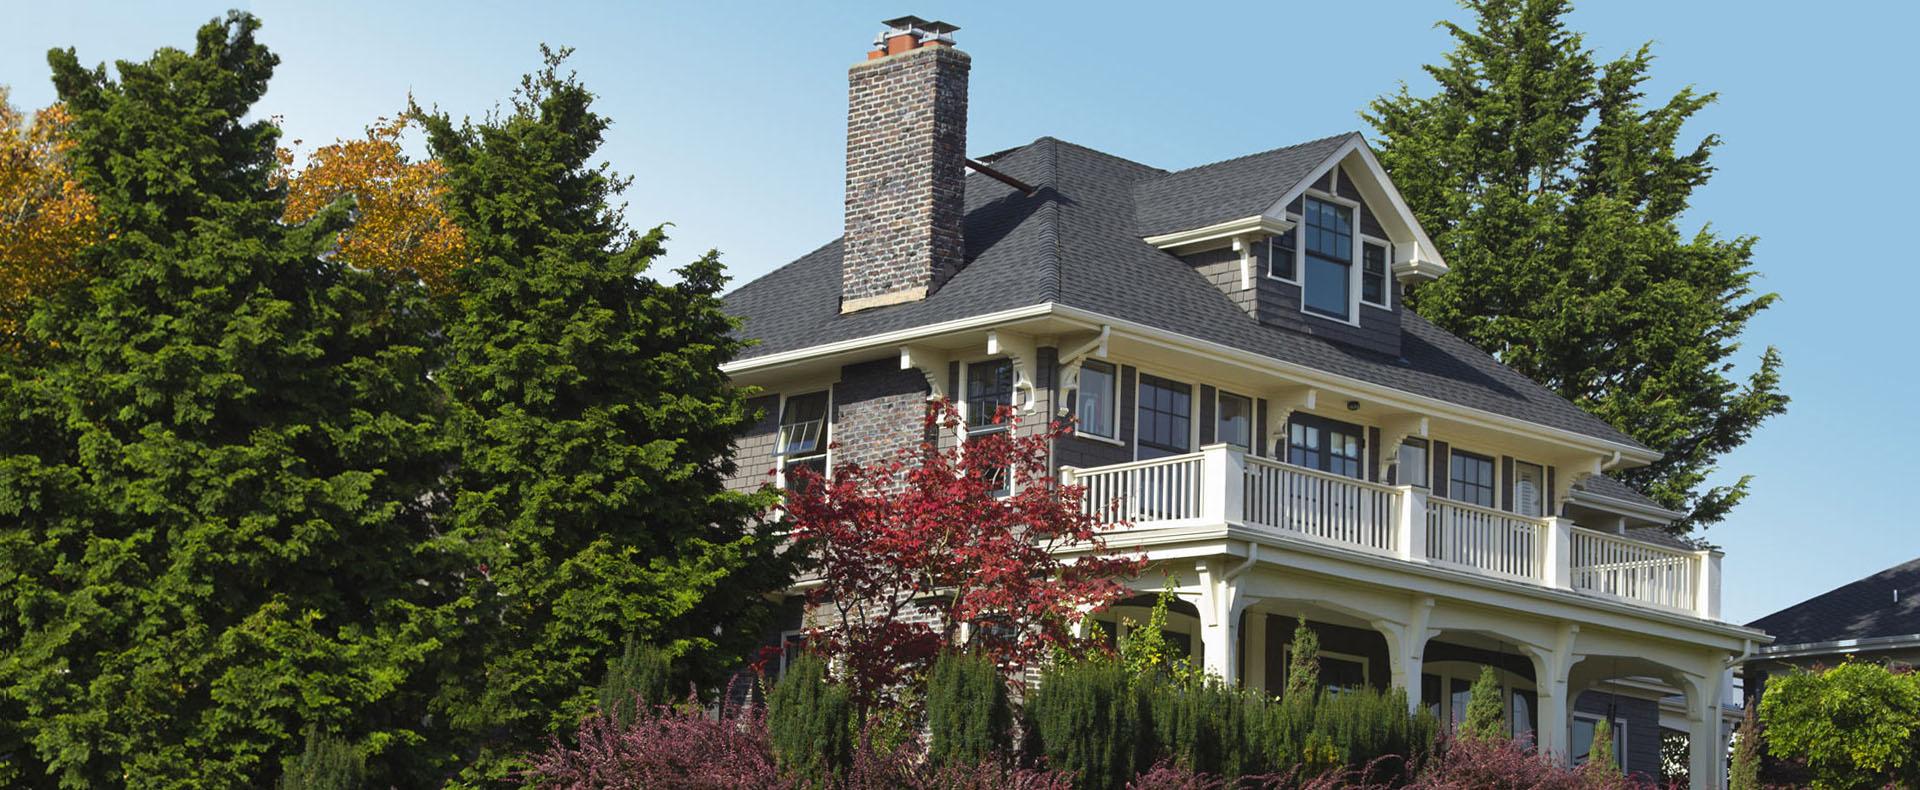 SEBI Corp Home Inspections